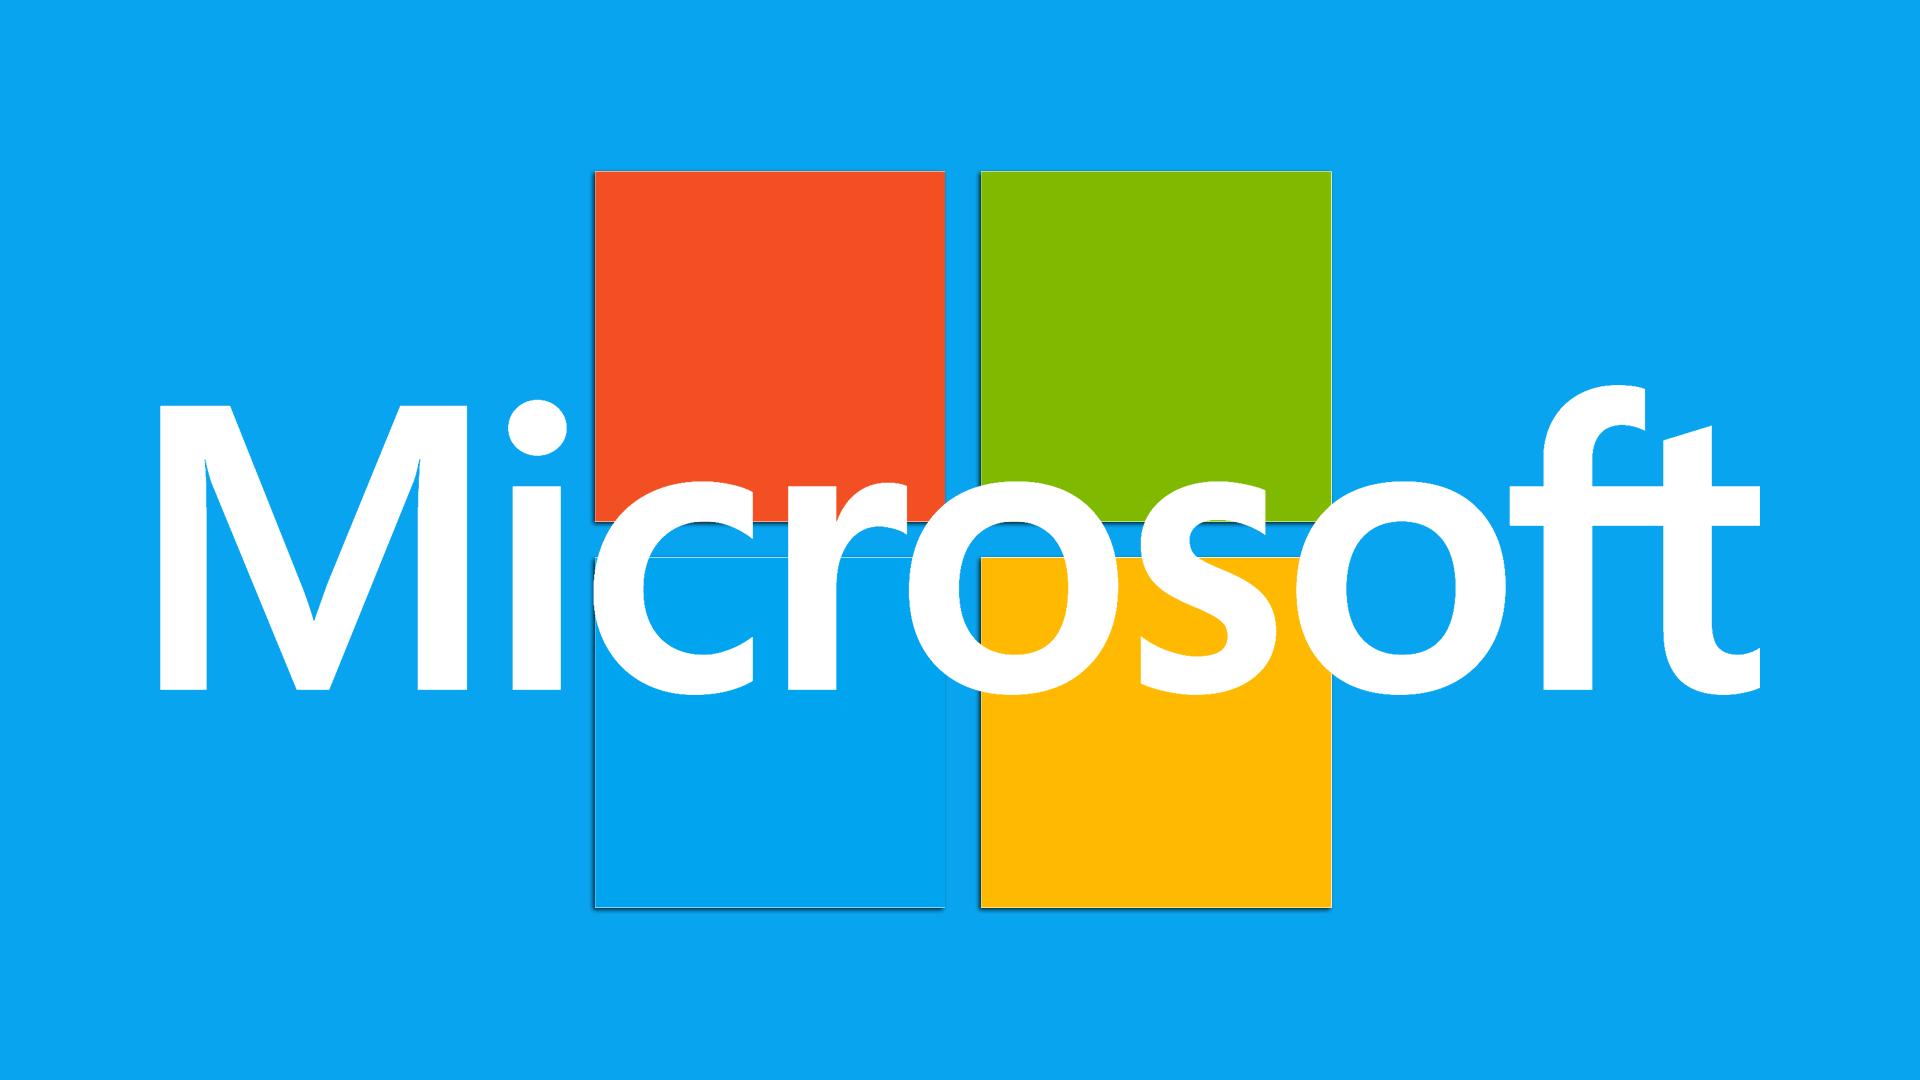 microsoft-logo-blue-1920